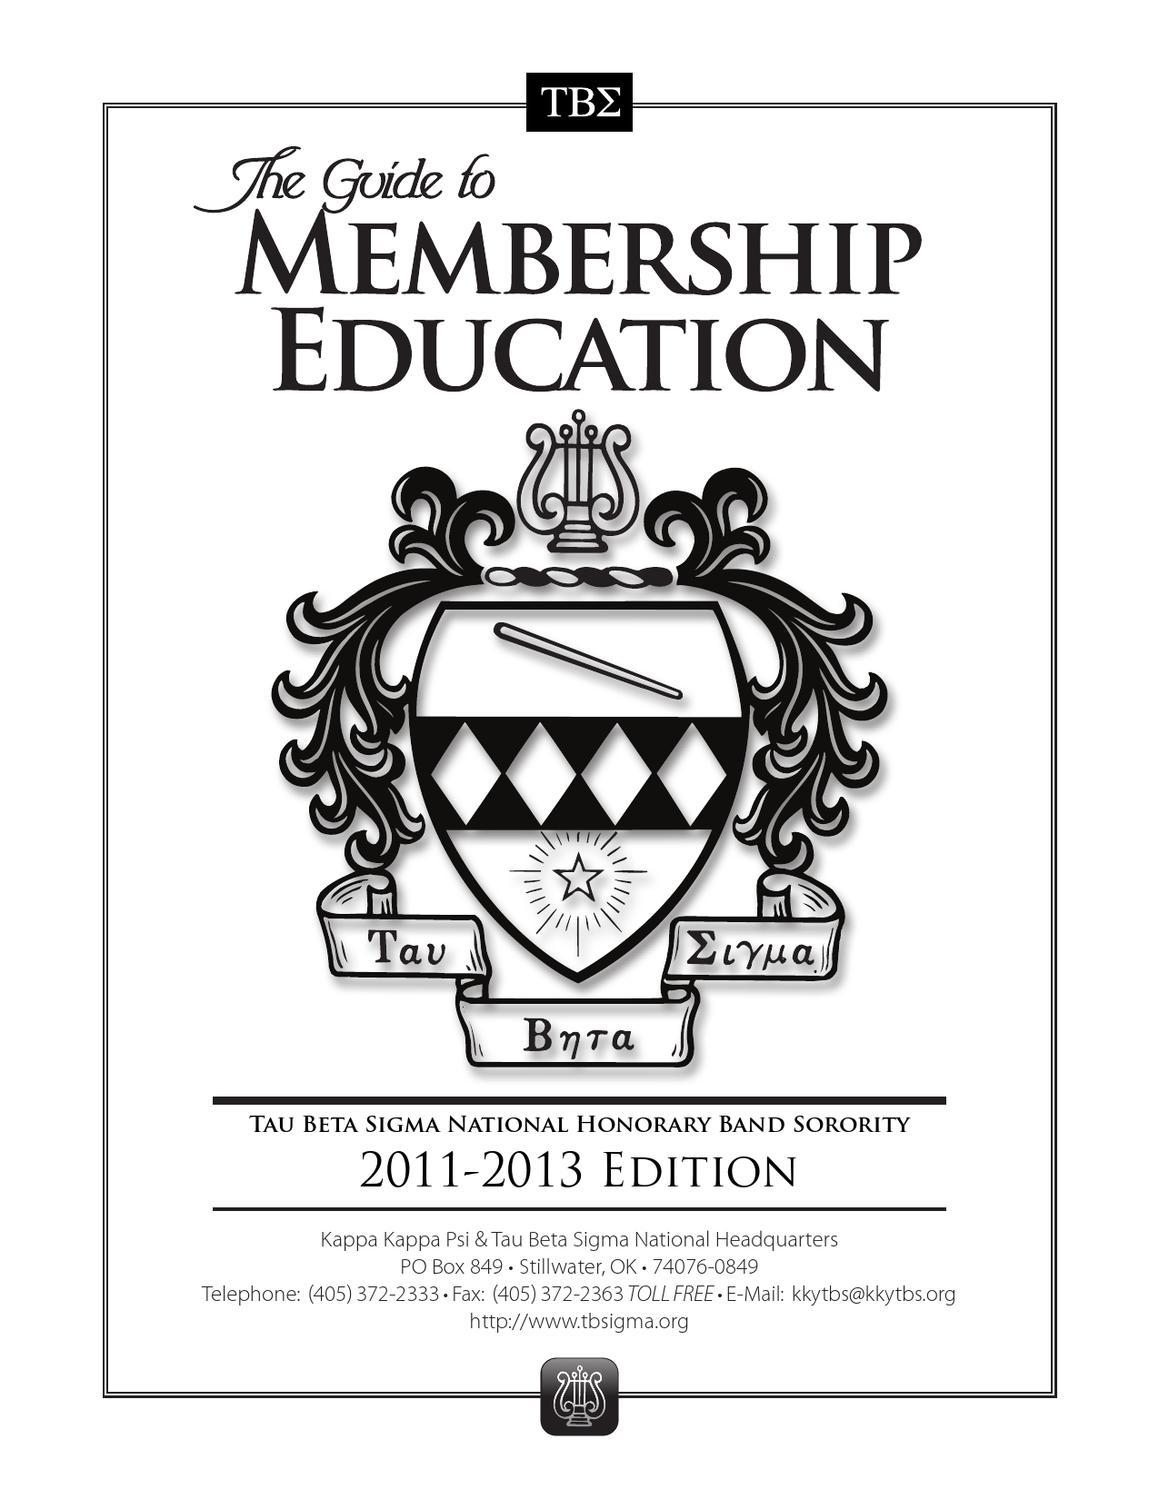 Tau Beta Sigma Guide to Membership by Kappa Kappa Psi